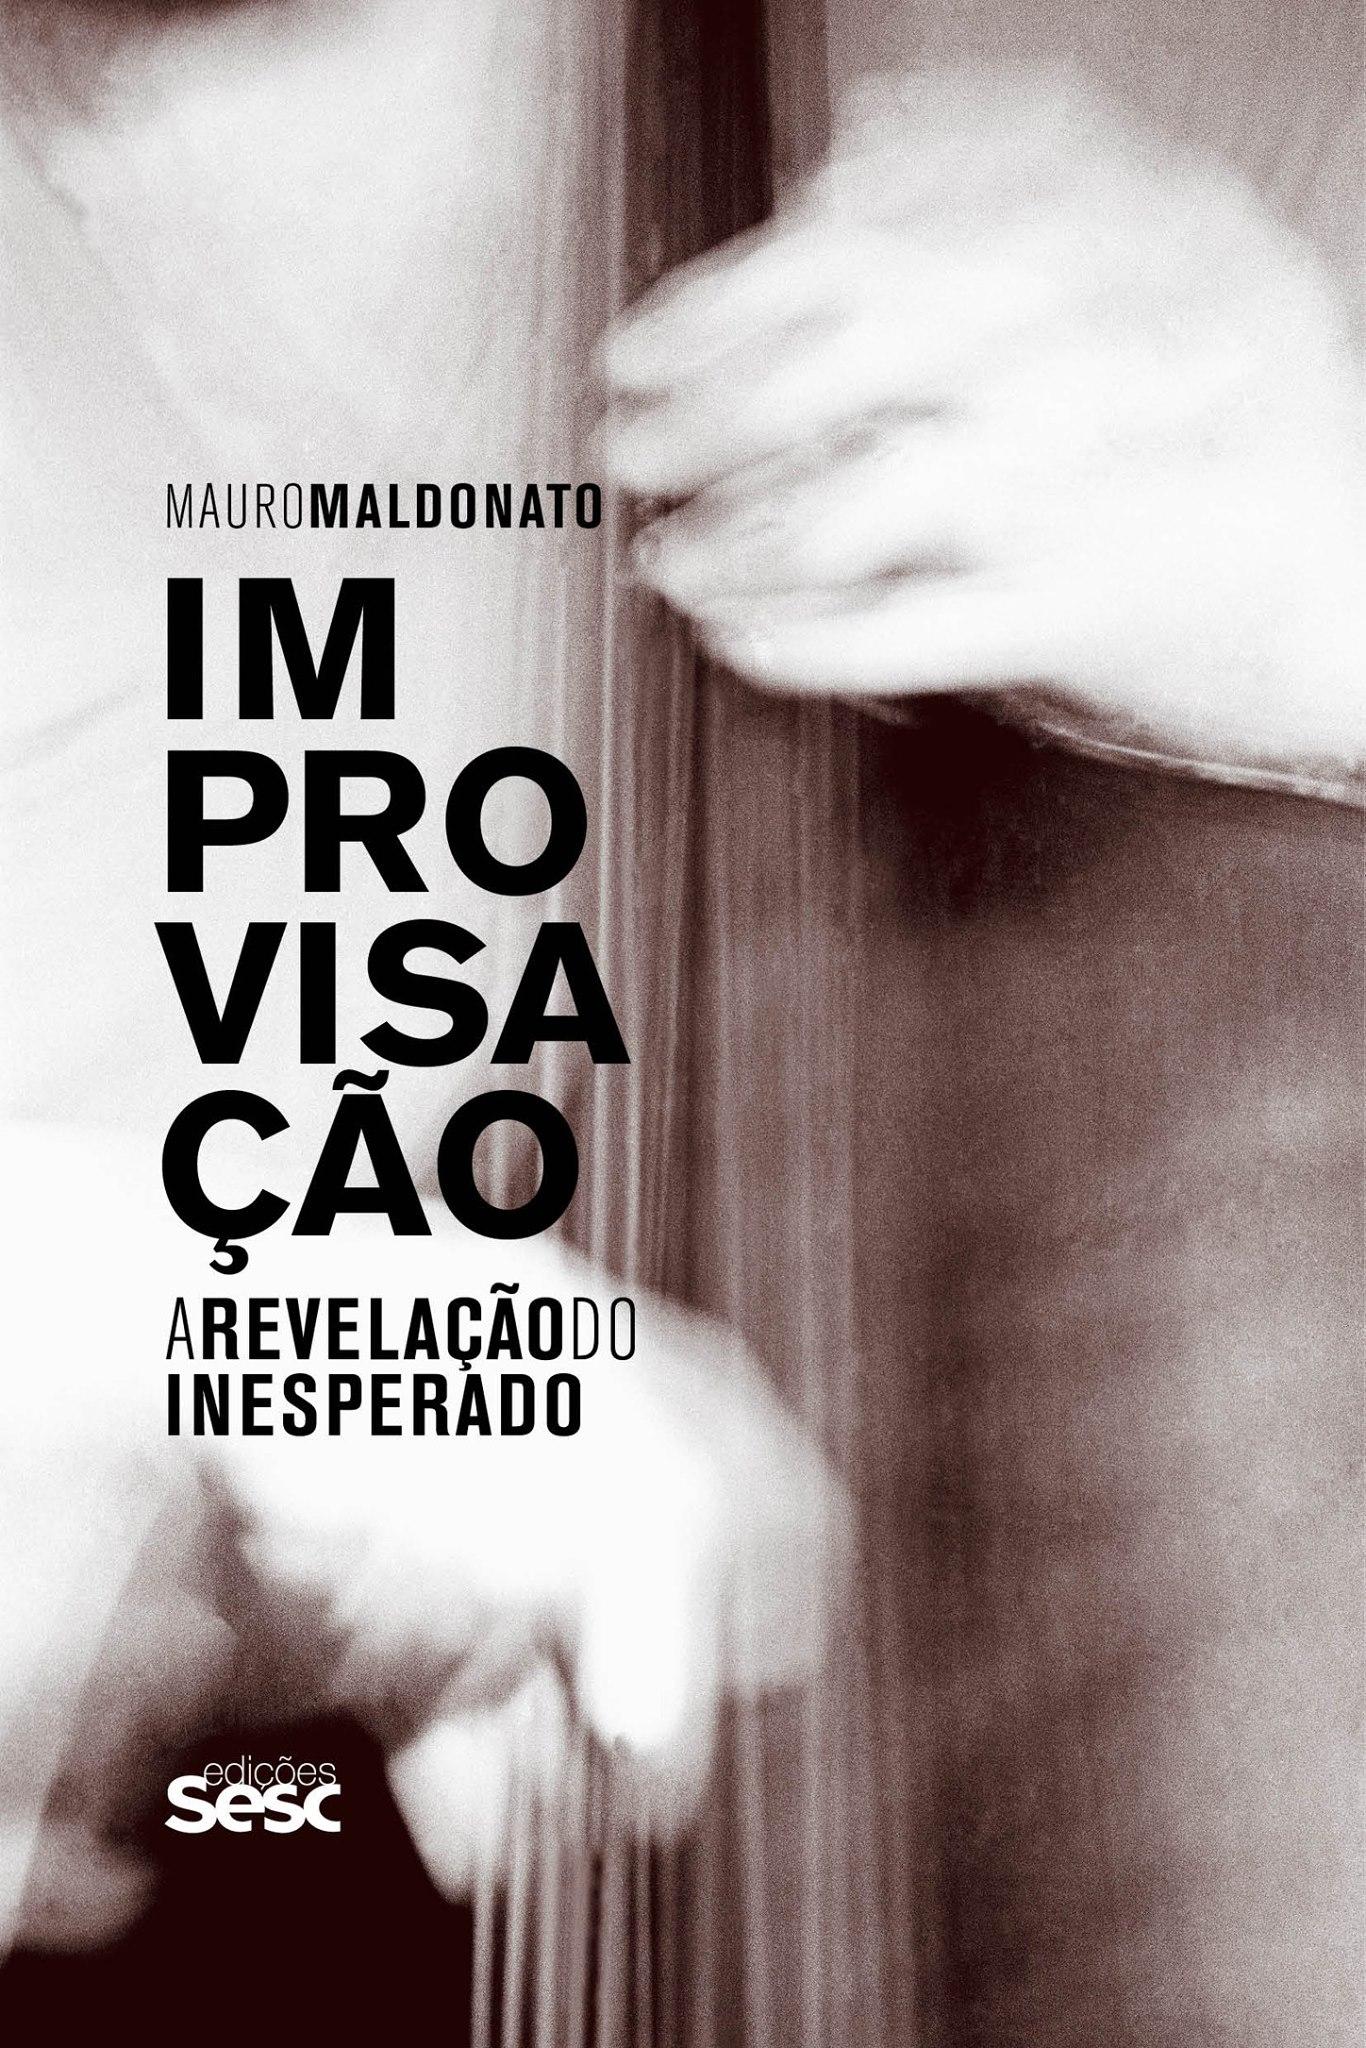 copertina_IMPROVISACAO_MAURO MALDONATO